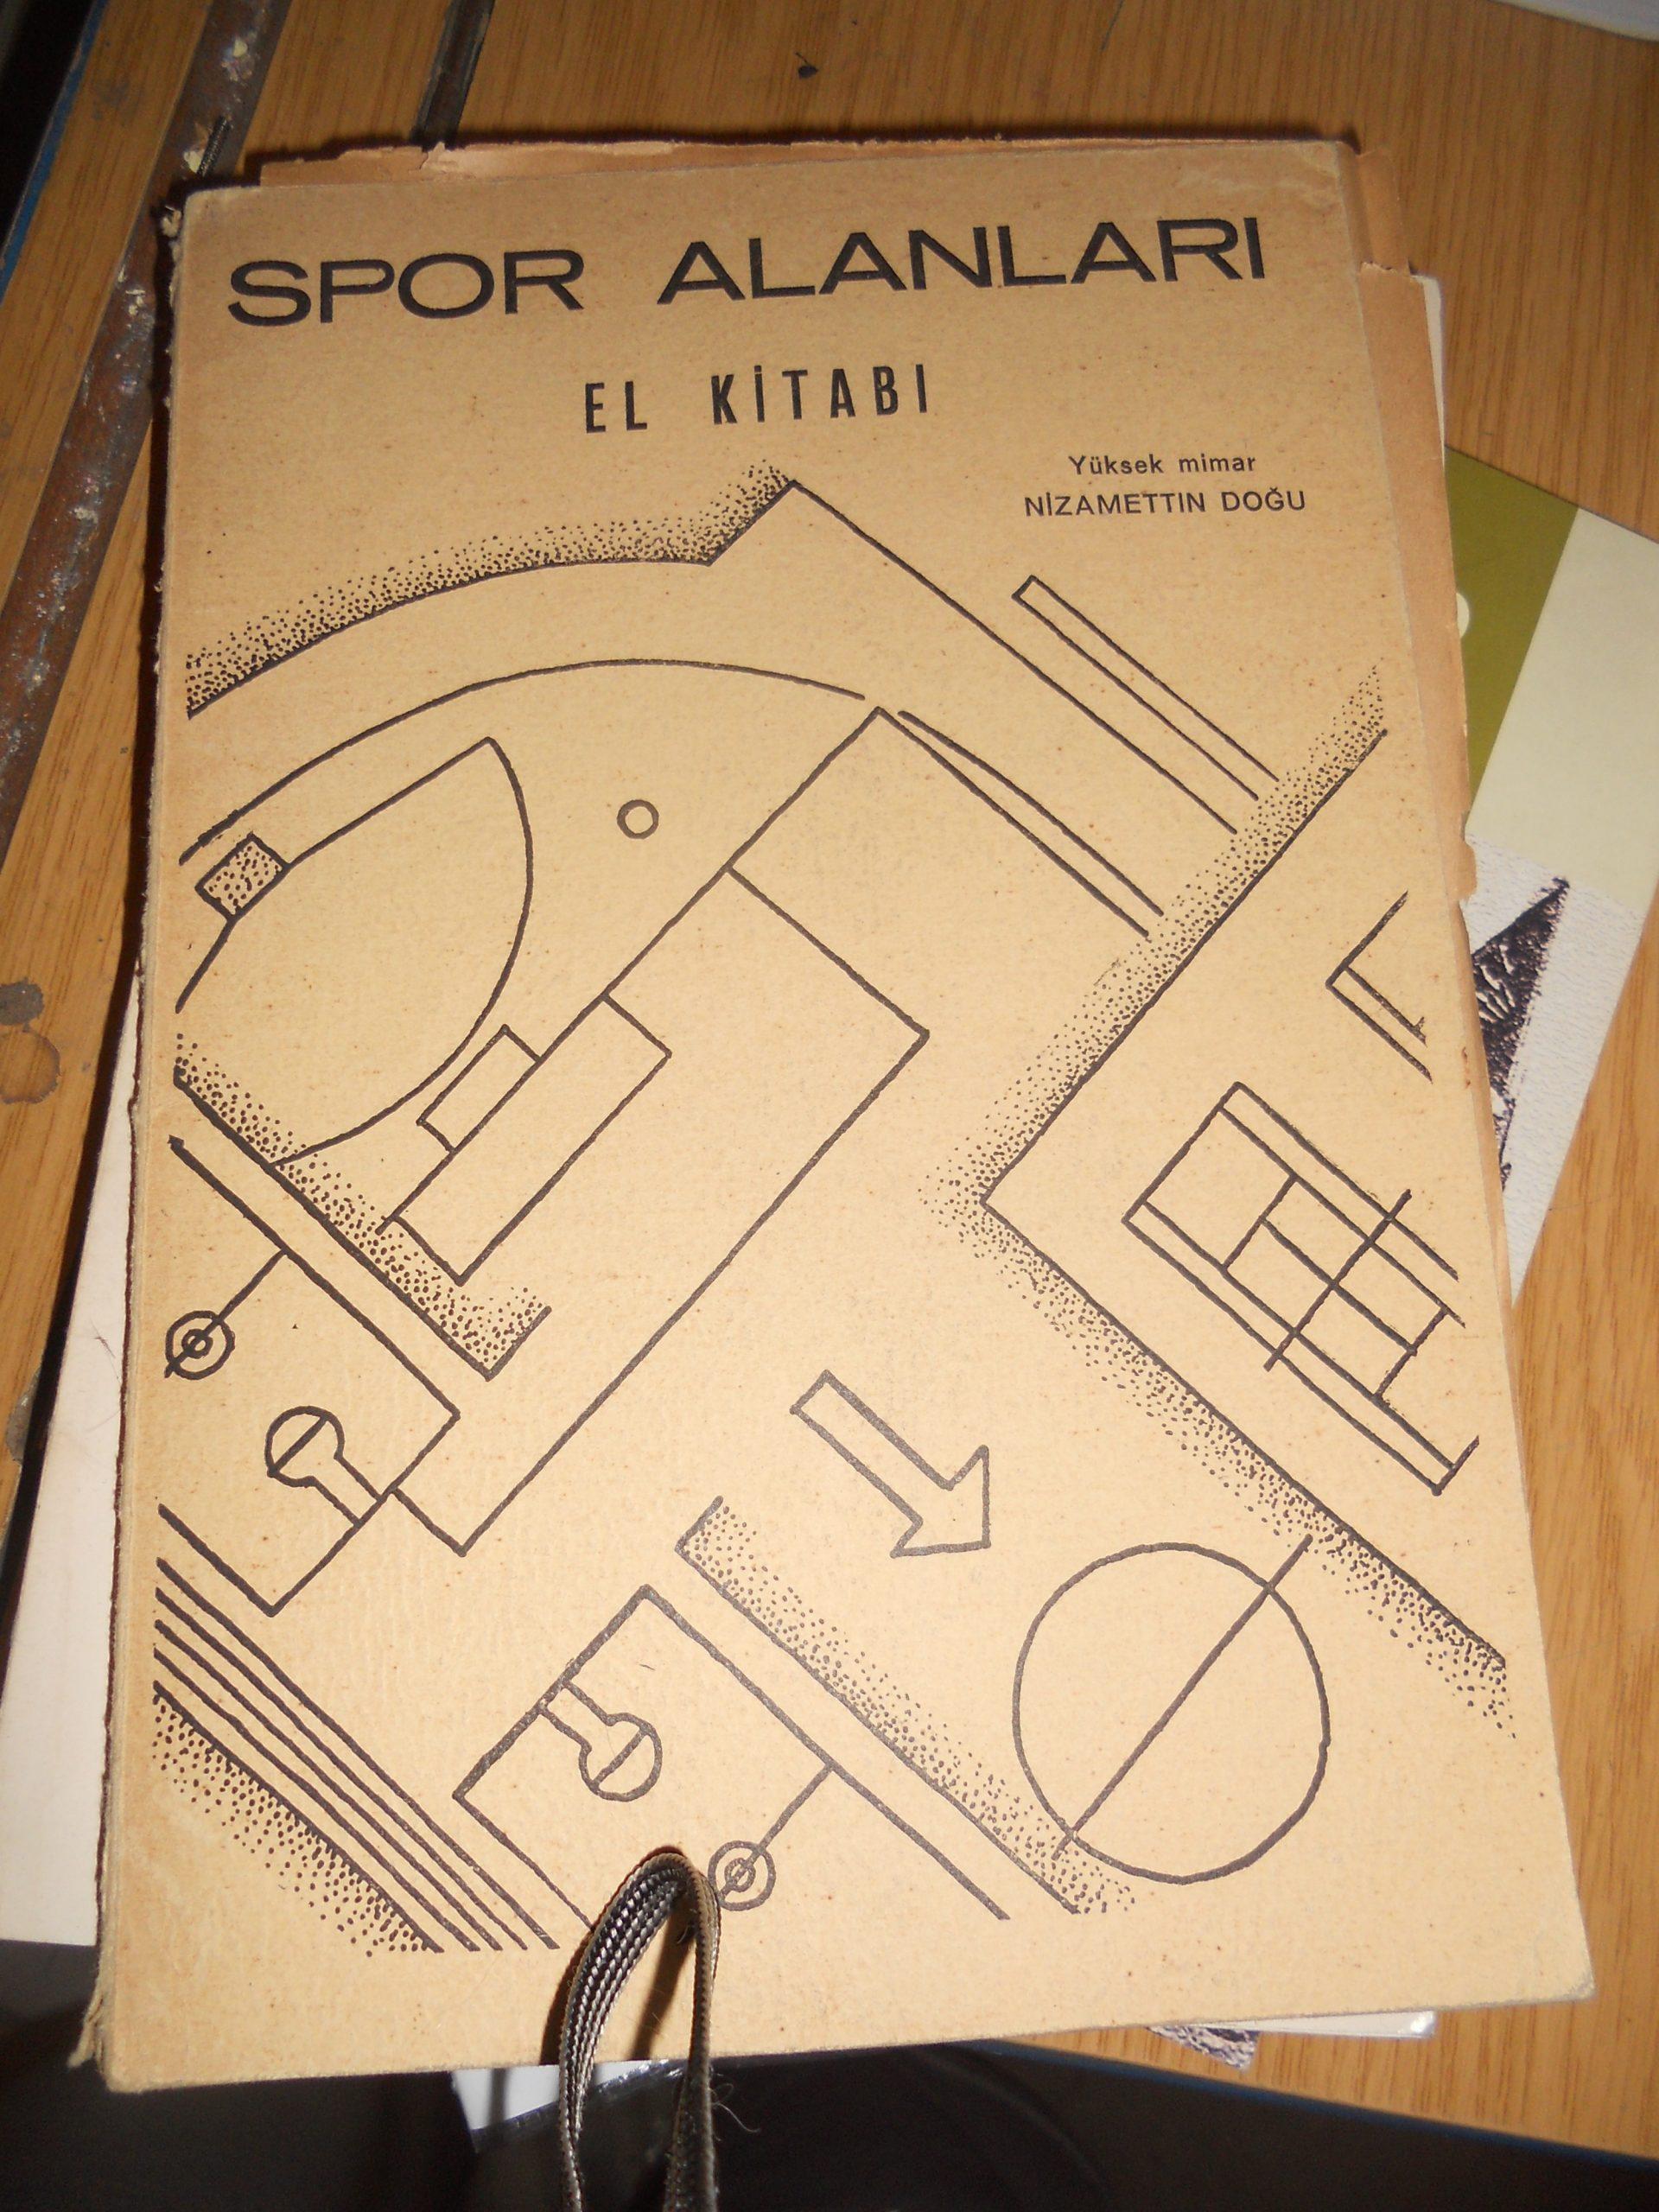 SPOR ALANLARI EL KİTAPLARI(1946 basım) / Nizamettin Doğu/50 TL